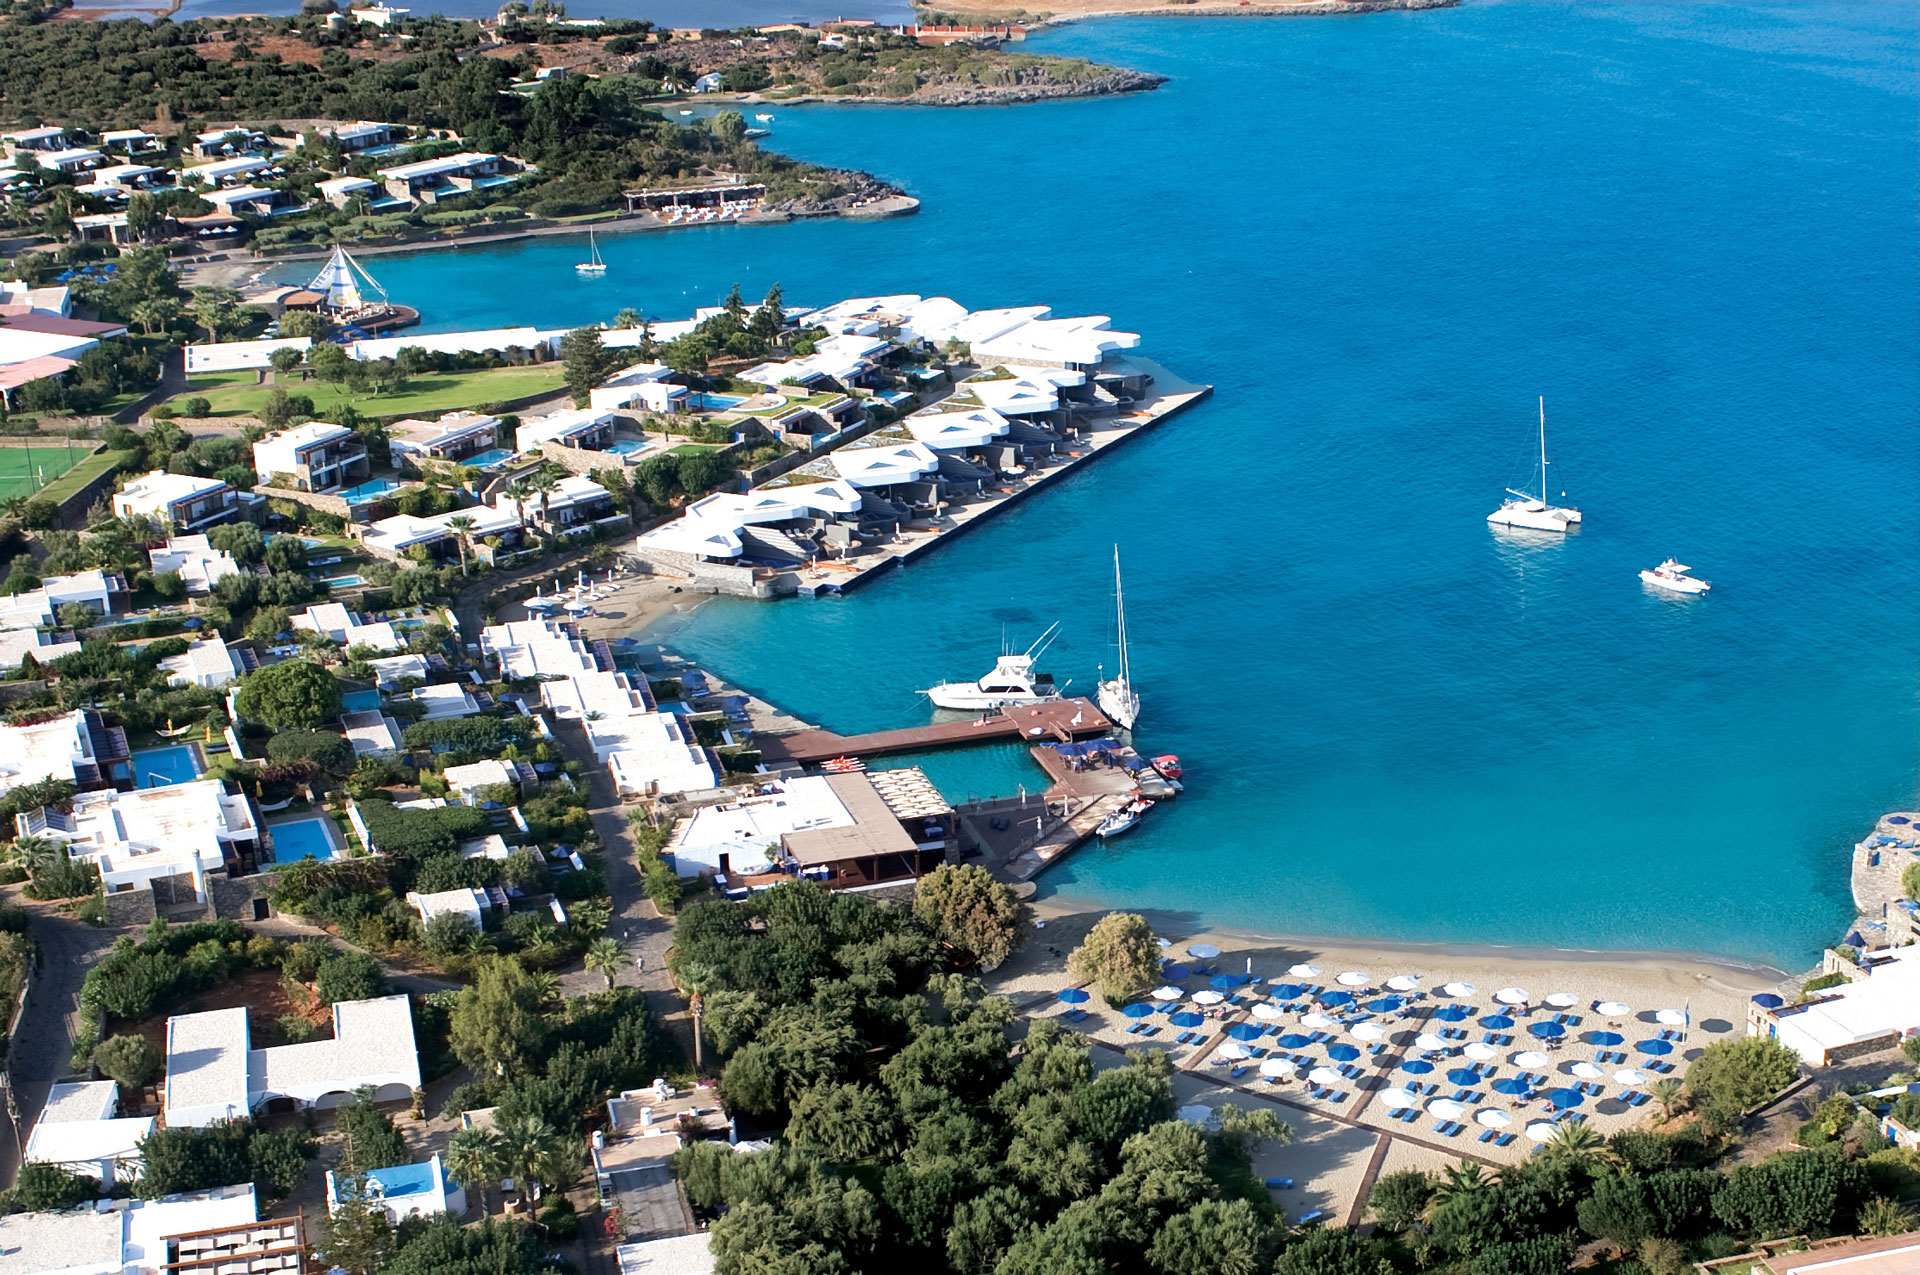 Elounda Beach Hotel & Elounda Villas